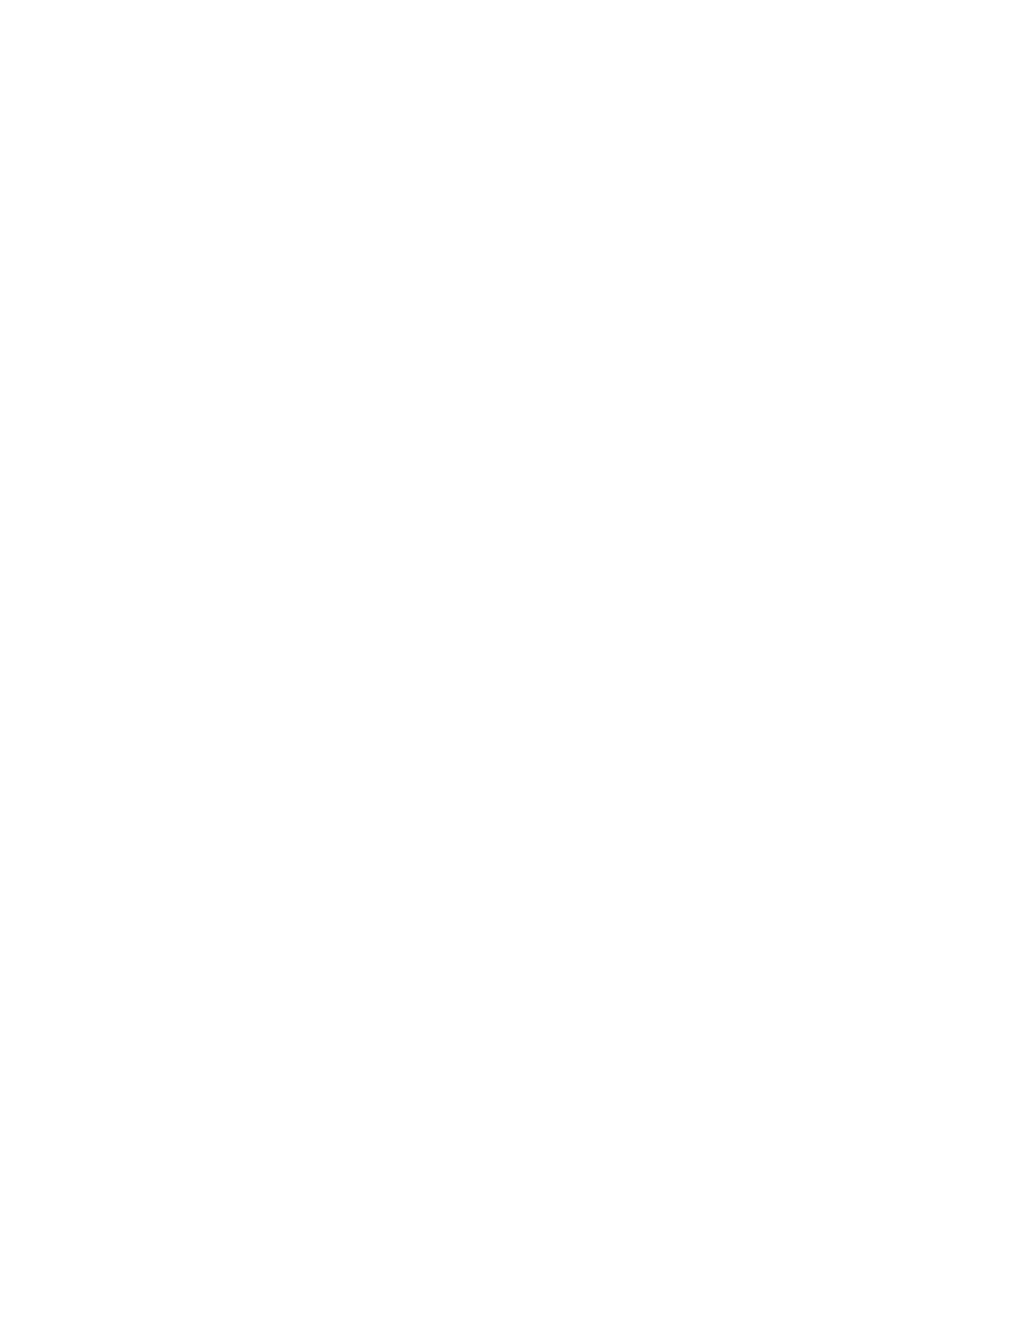 Foxx Ltd Logo Redo and Update